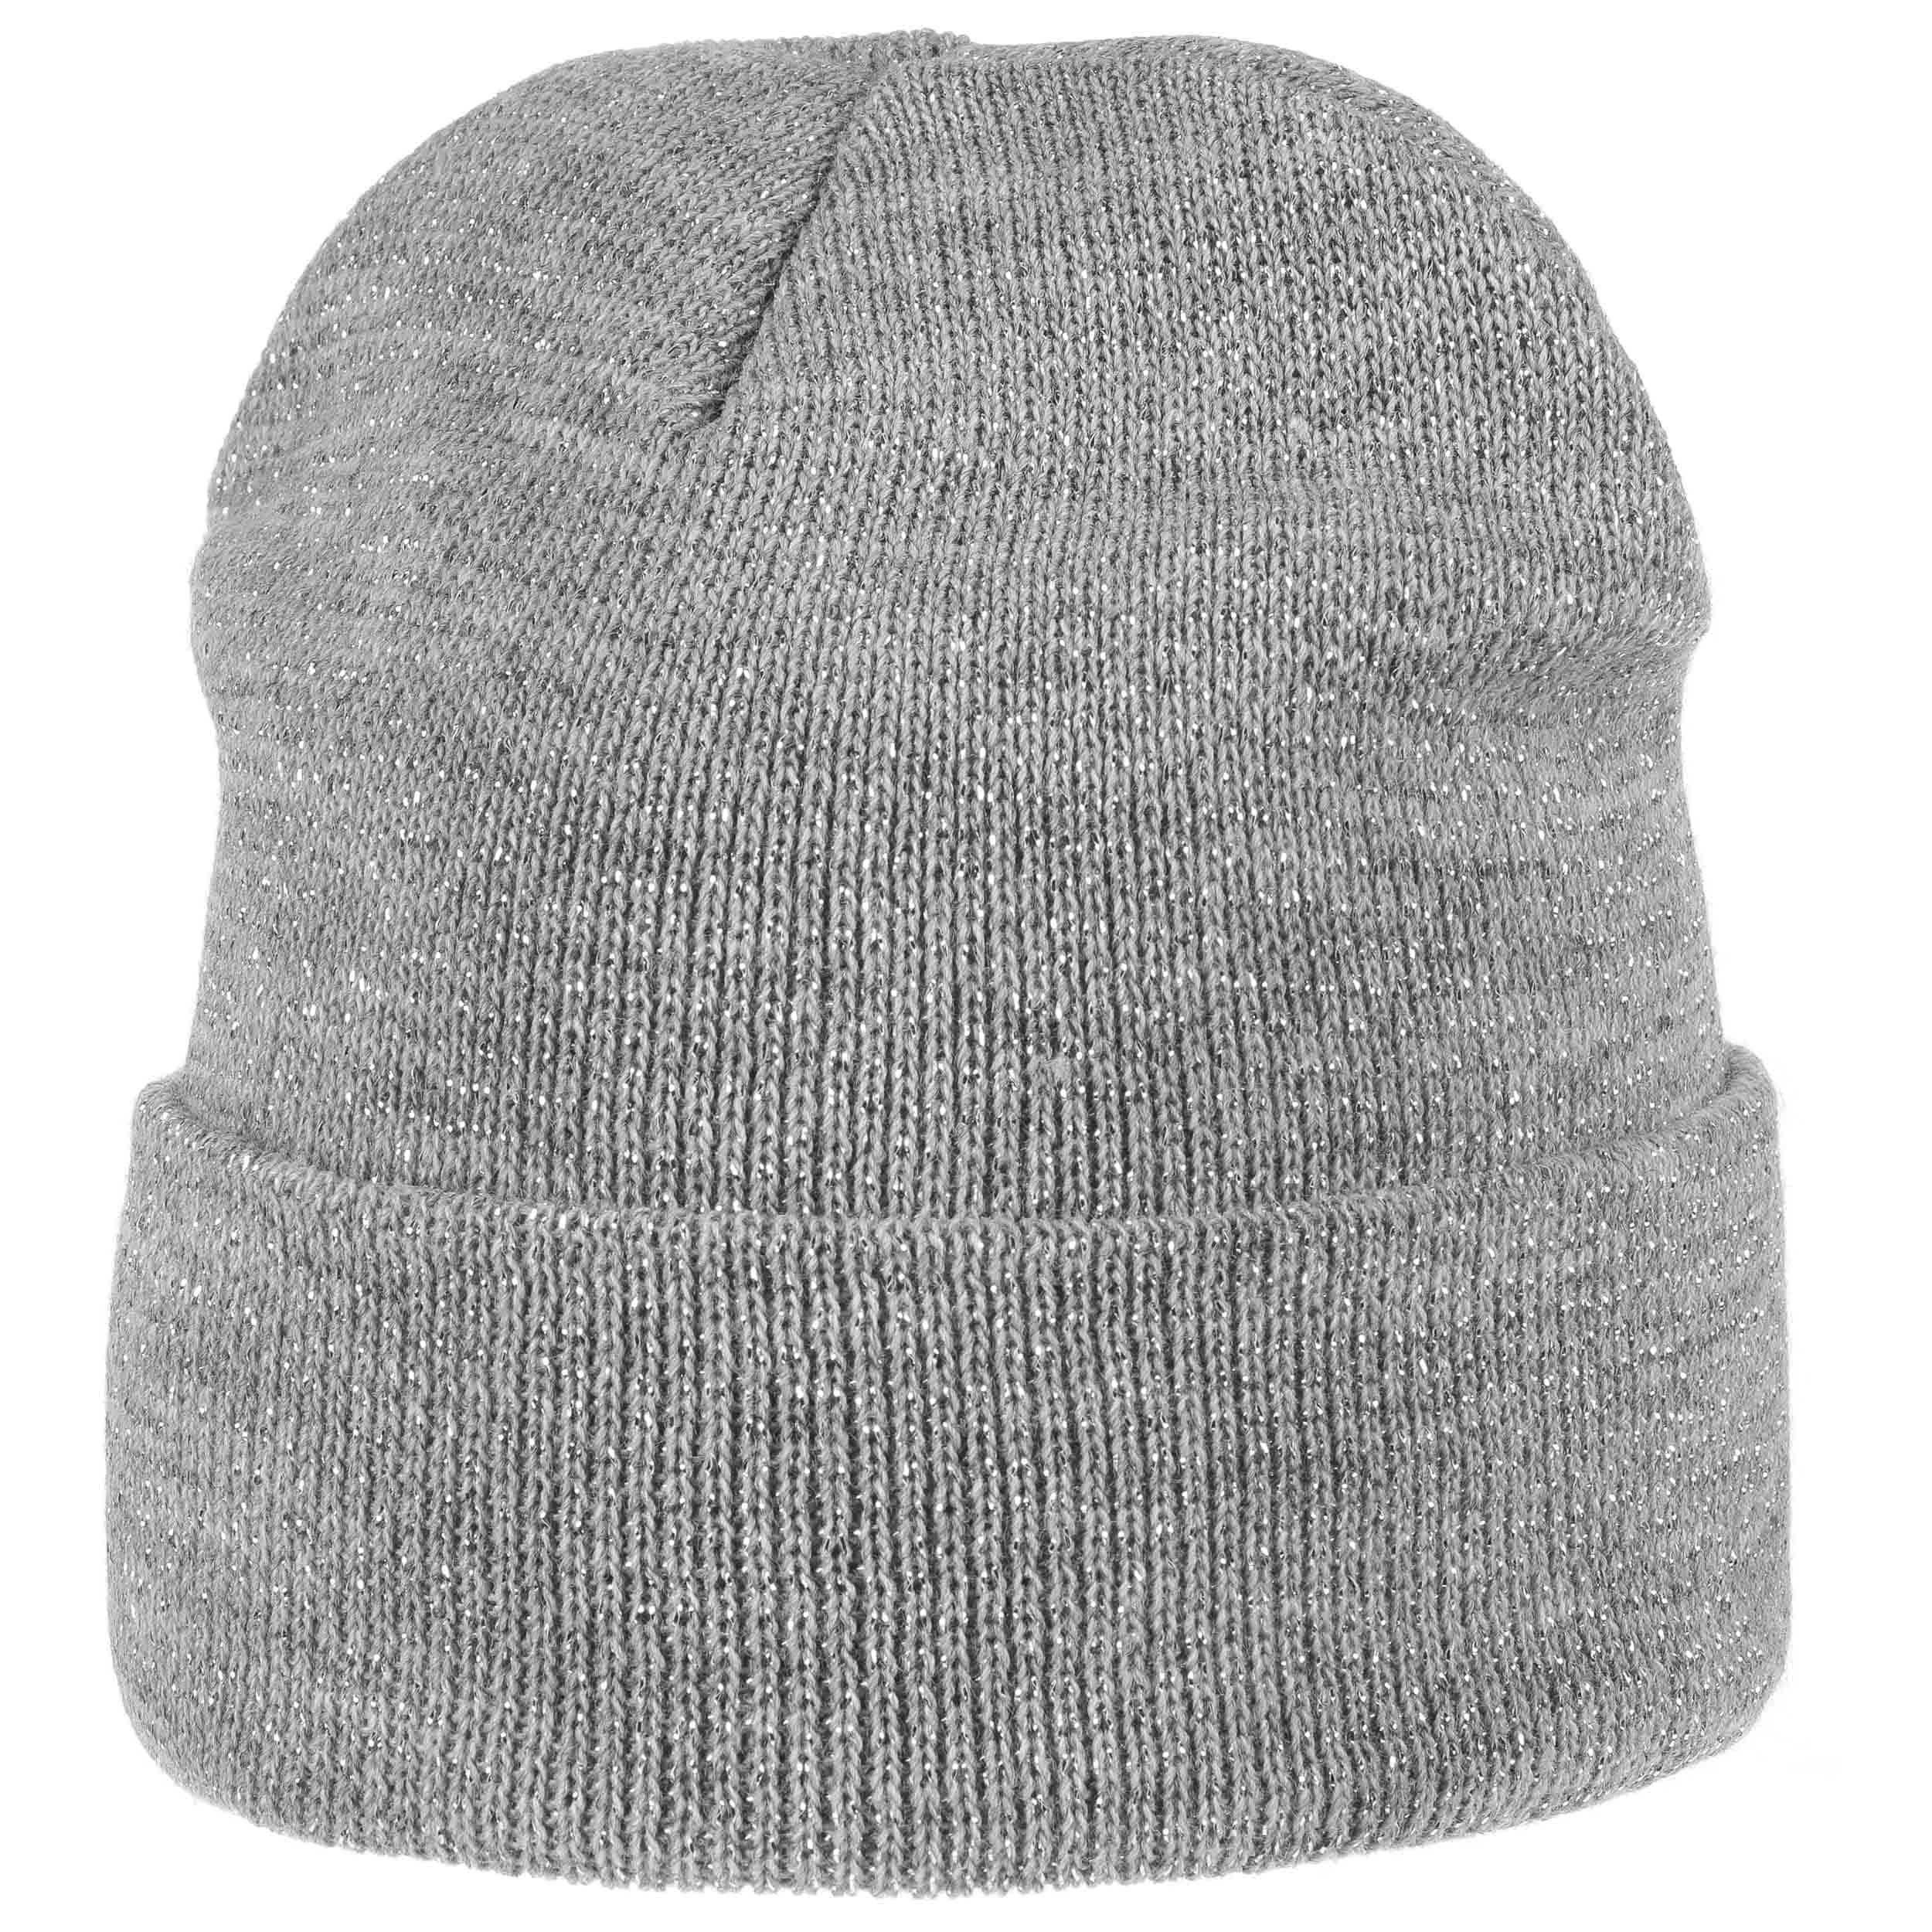 8004680f989da ... Glitter Beanie Hat with Cuff by Lipodo - grey 5 ...